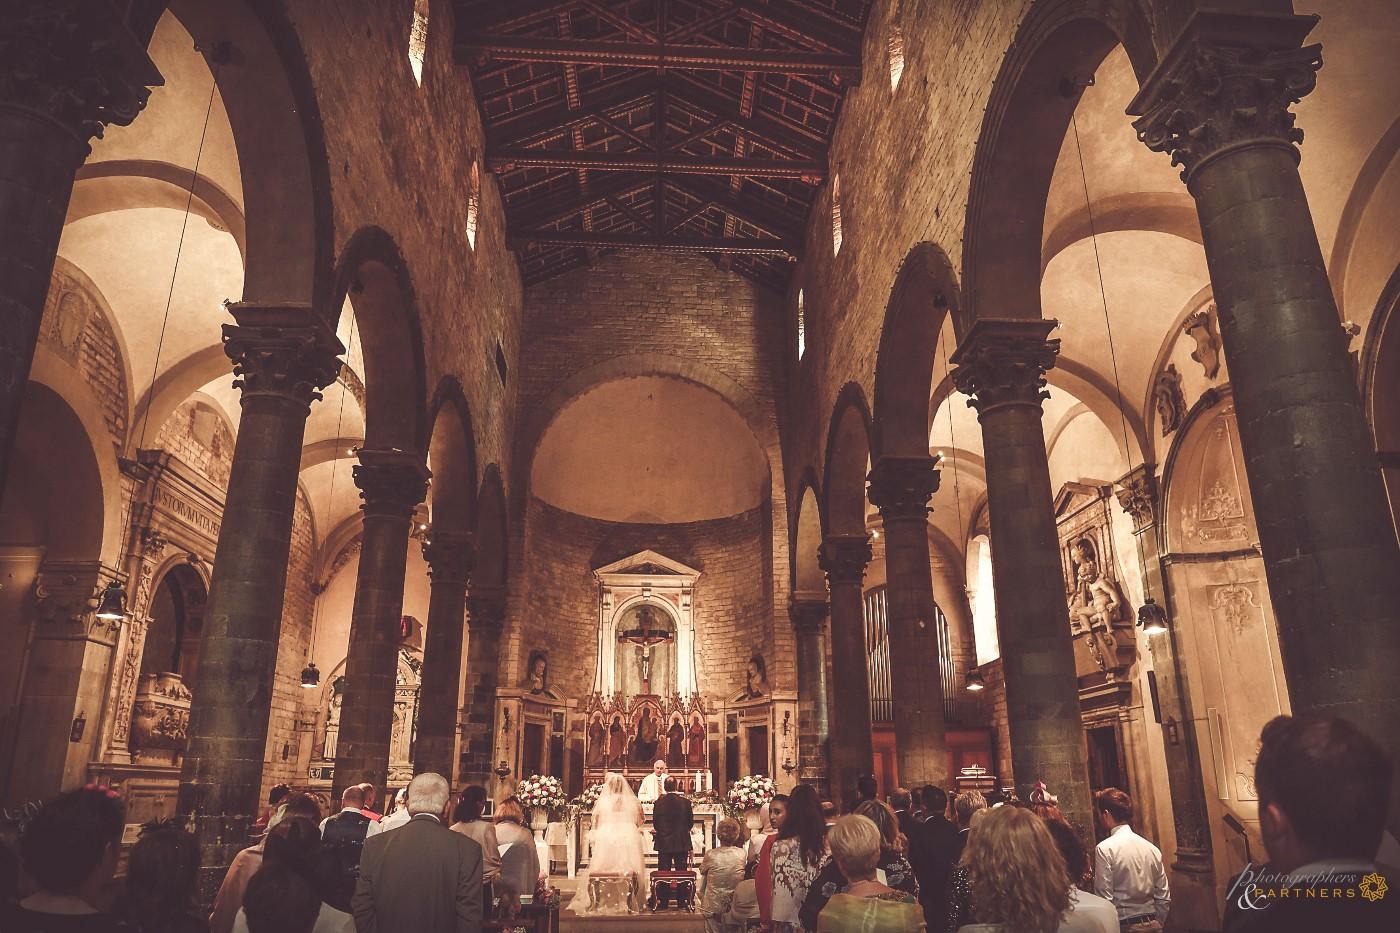 A panoramic photo inside the beautiful church.